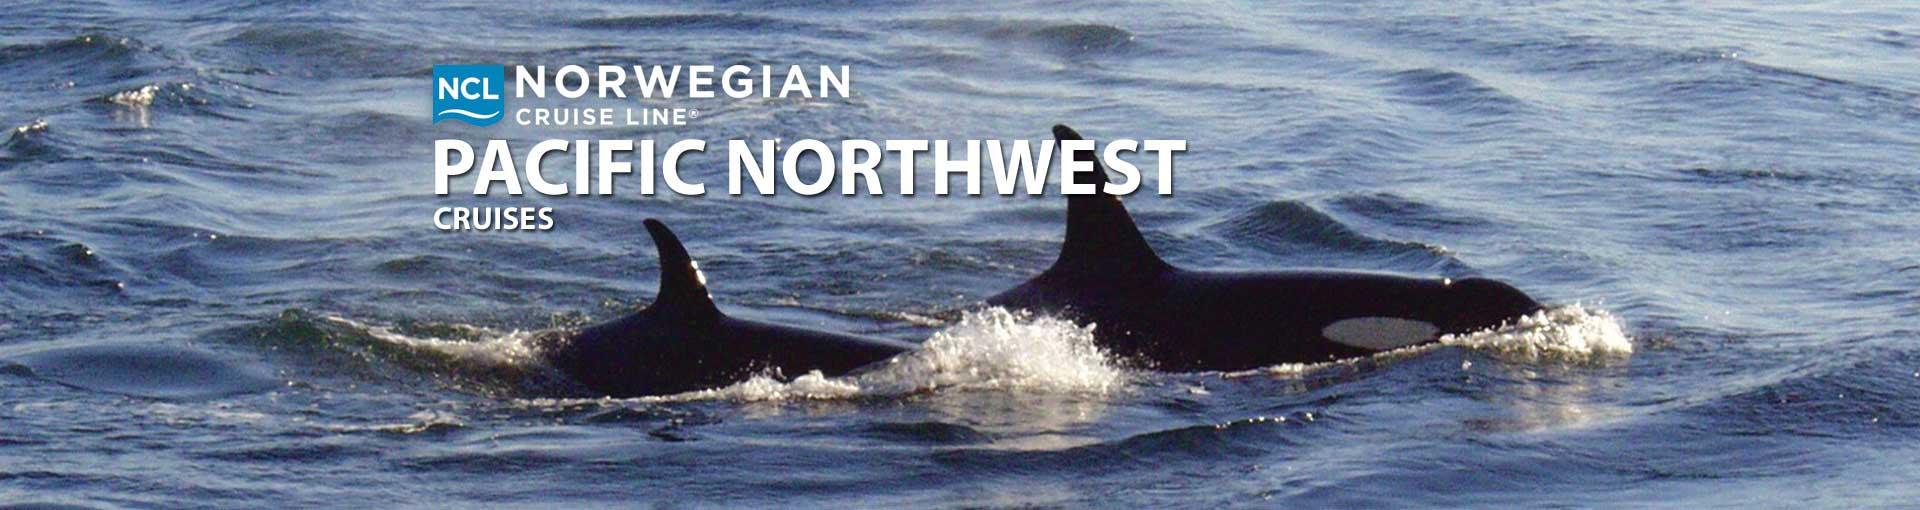 Norwegian Cruise Line U.S. Pacific Coast Cruises